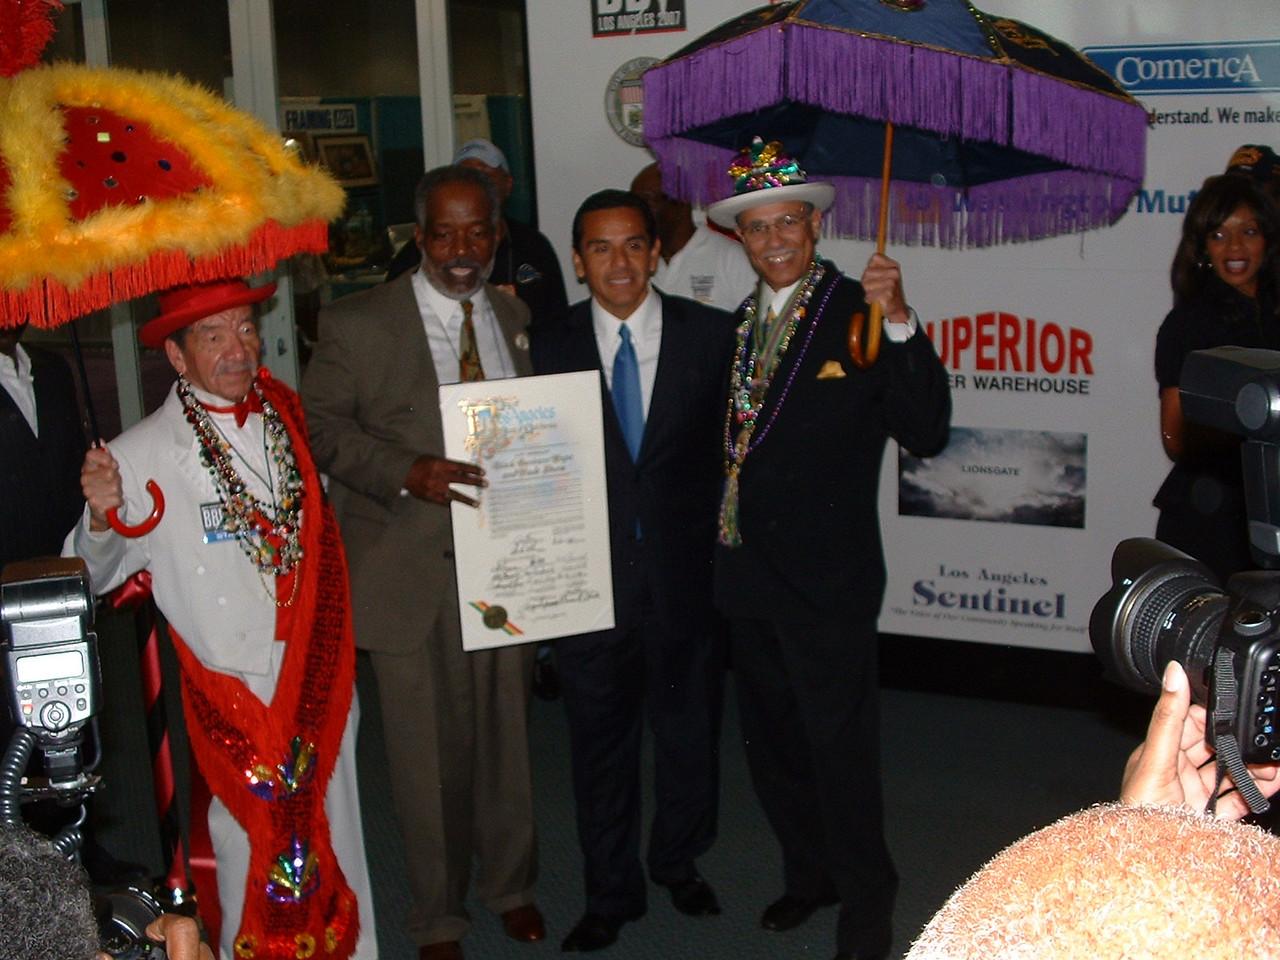 Mayor Villaraigosa gave the Expo a proclamation from the City of Los Angeles.